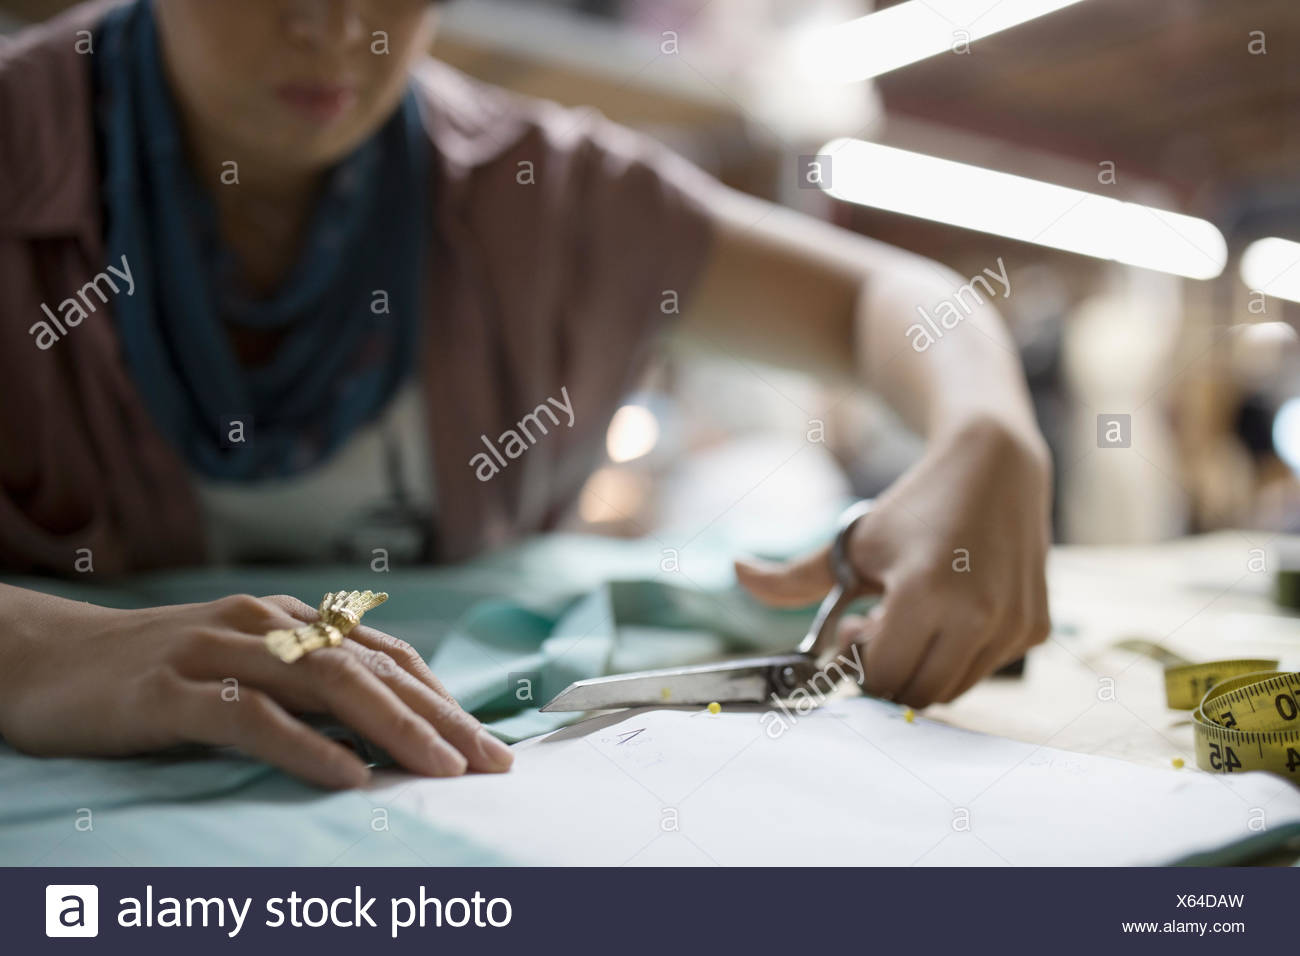 Female fashion designer cutting fabric with scissors - Stock Image